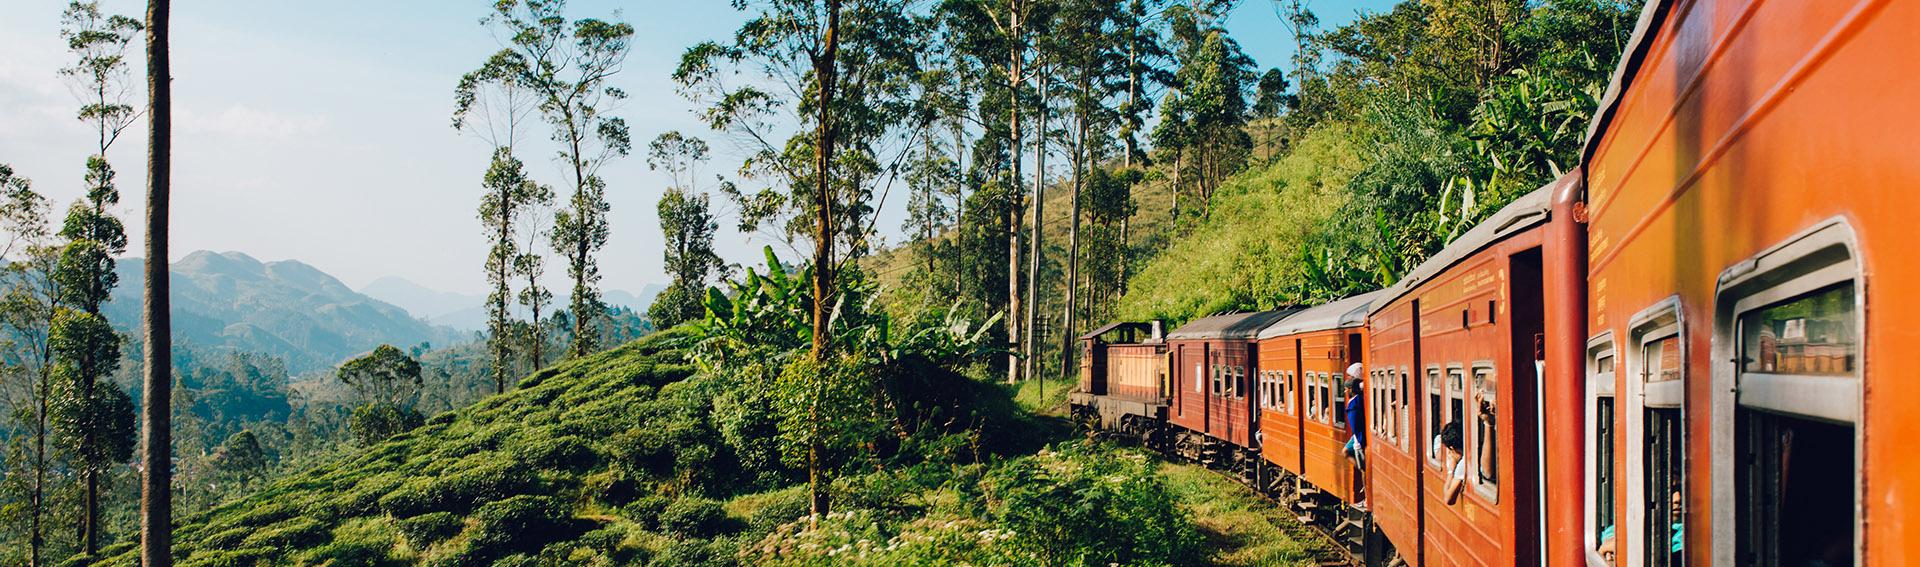 Sri Lanka, Train, Journey, Landscapes